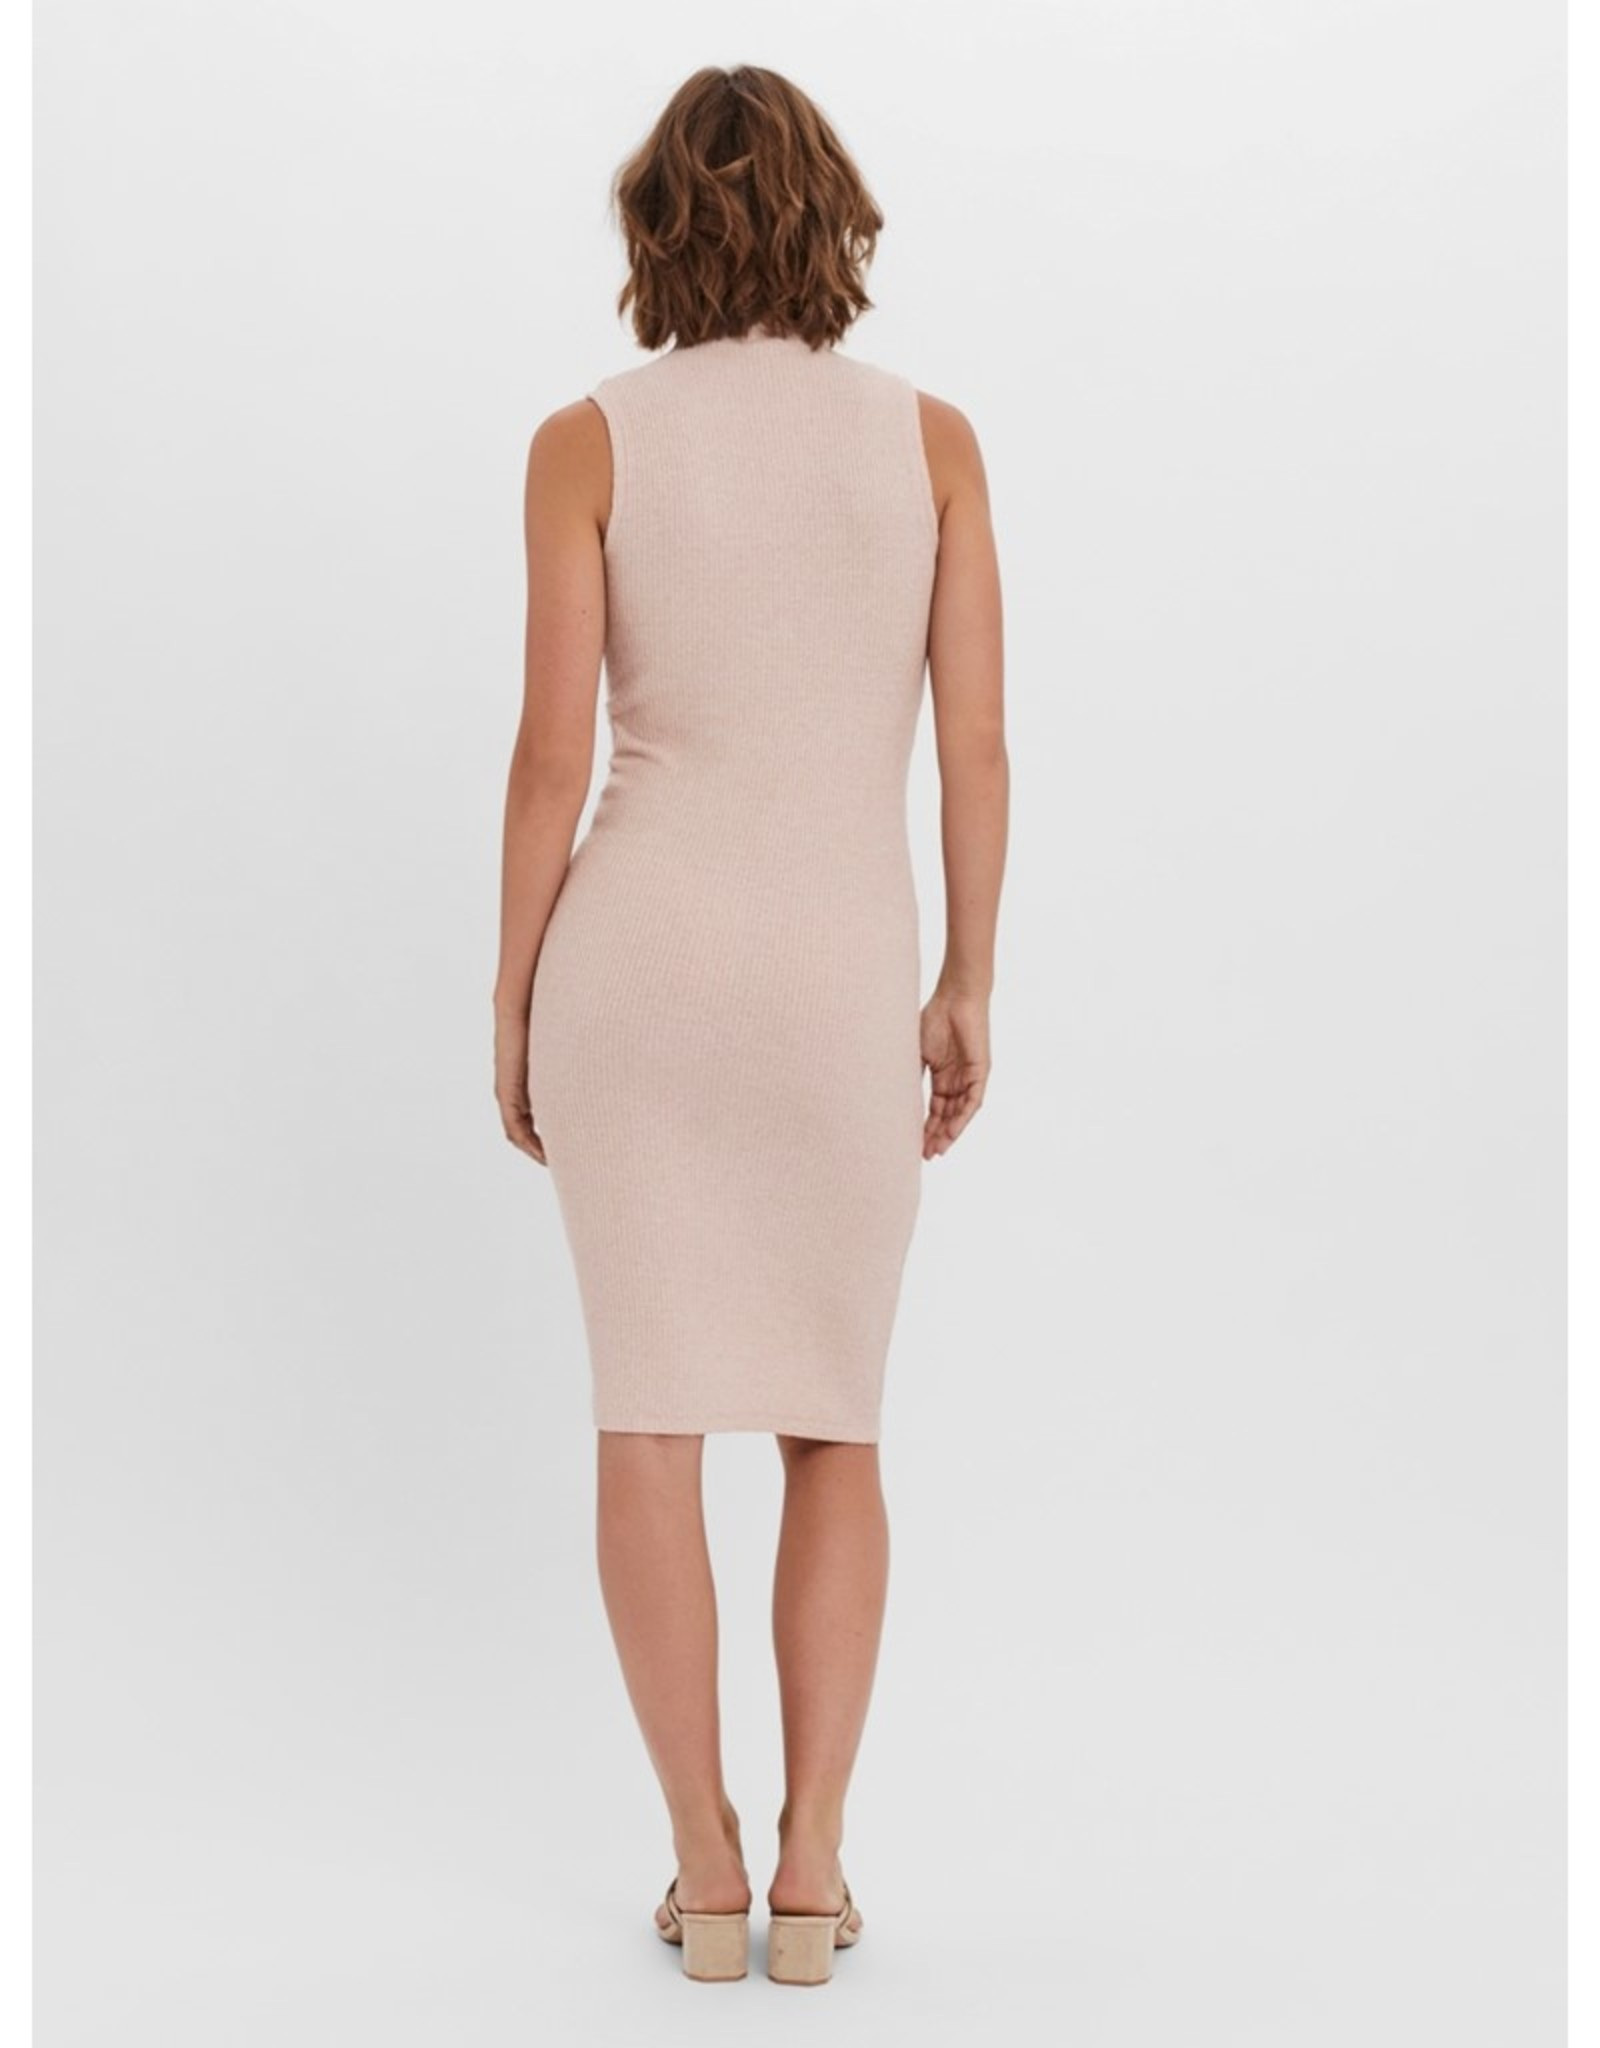 Vero Moda Tiana Mock-Neck Midi Dress